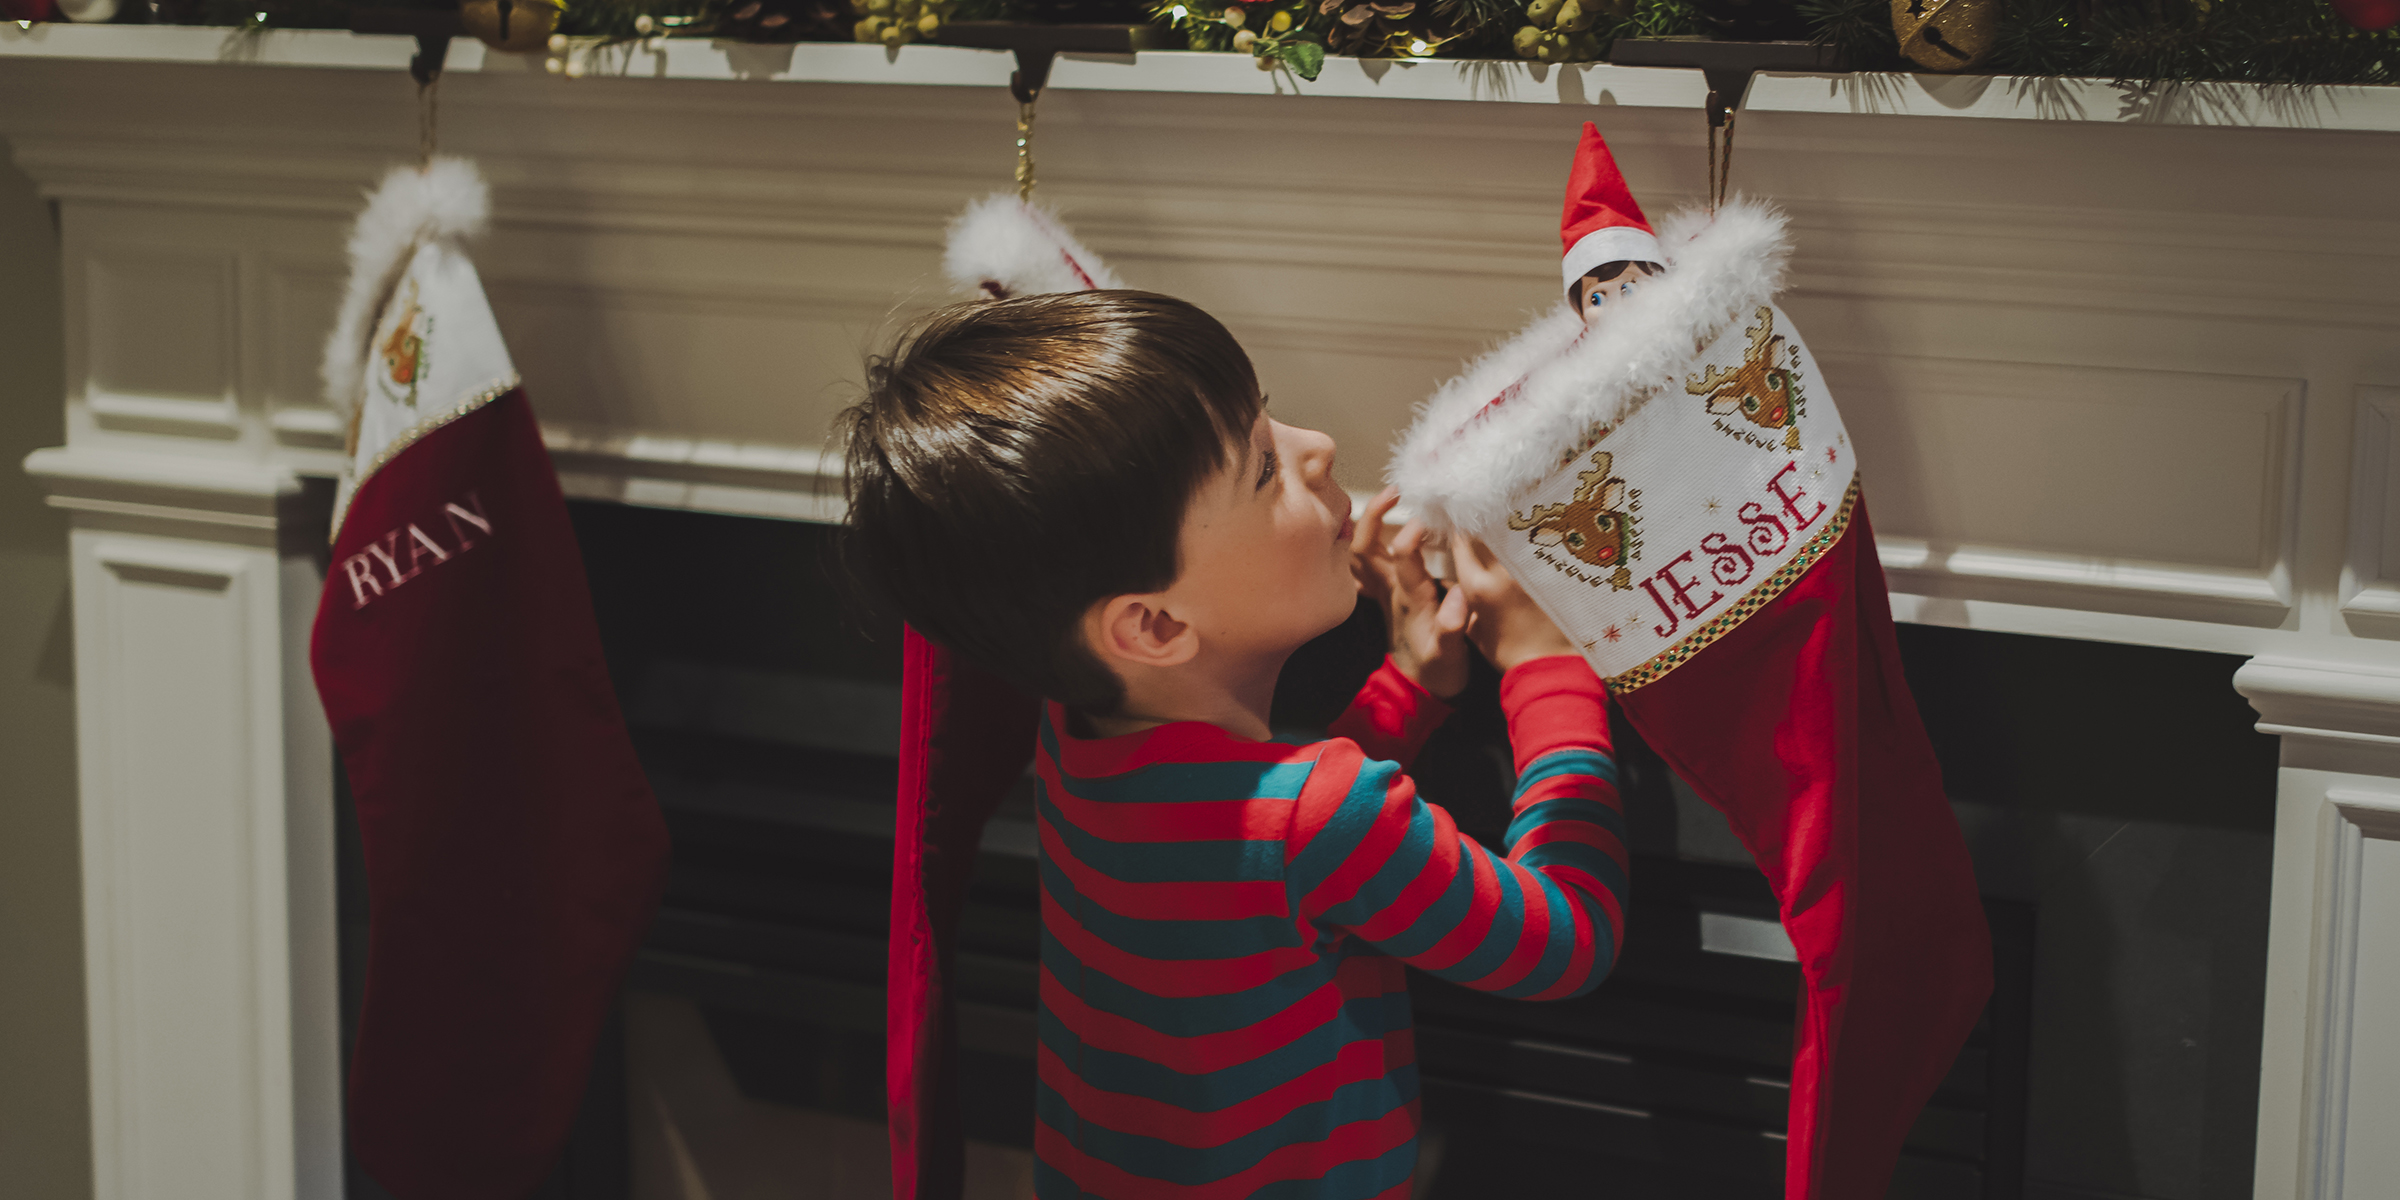 42 best stocking stuffers for men, women, teens and kids